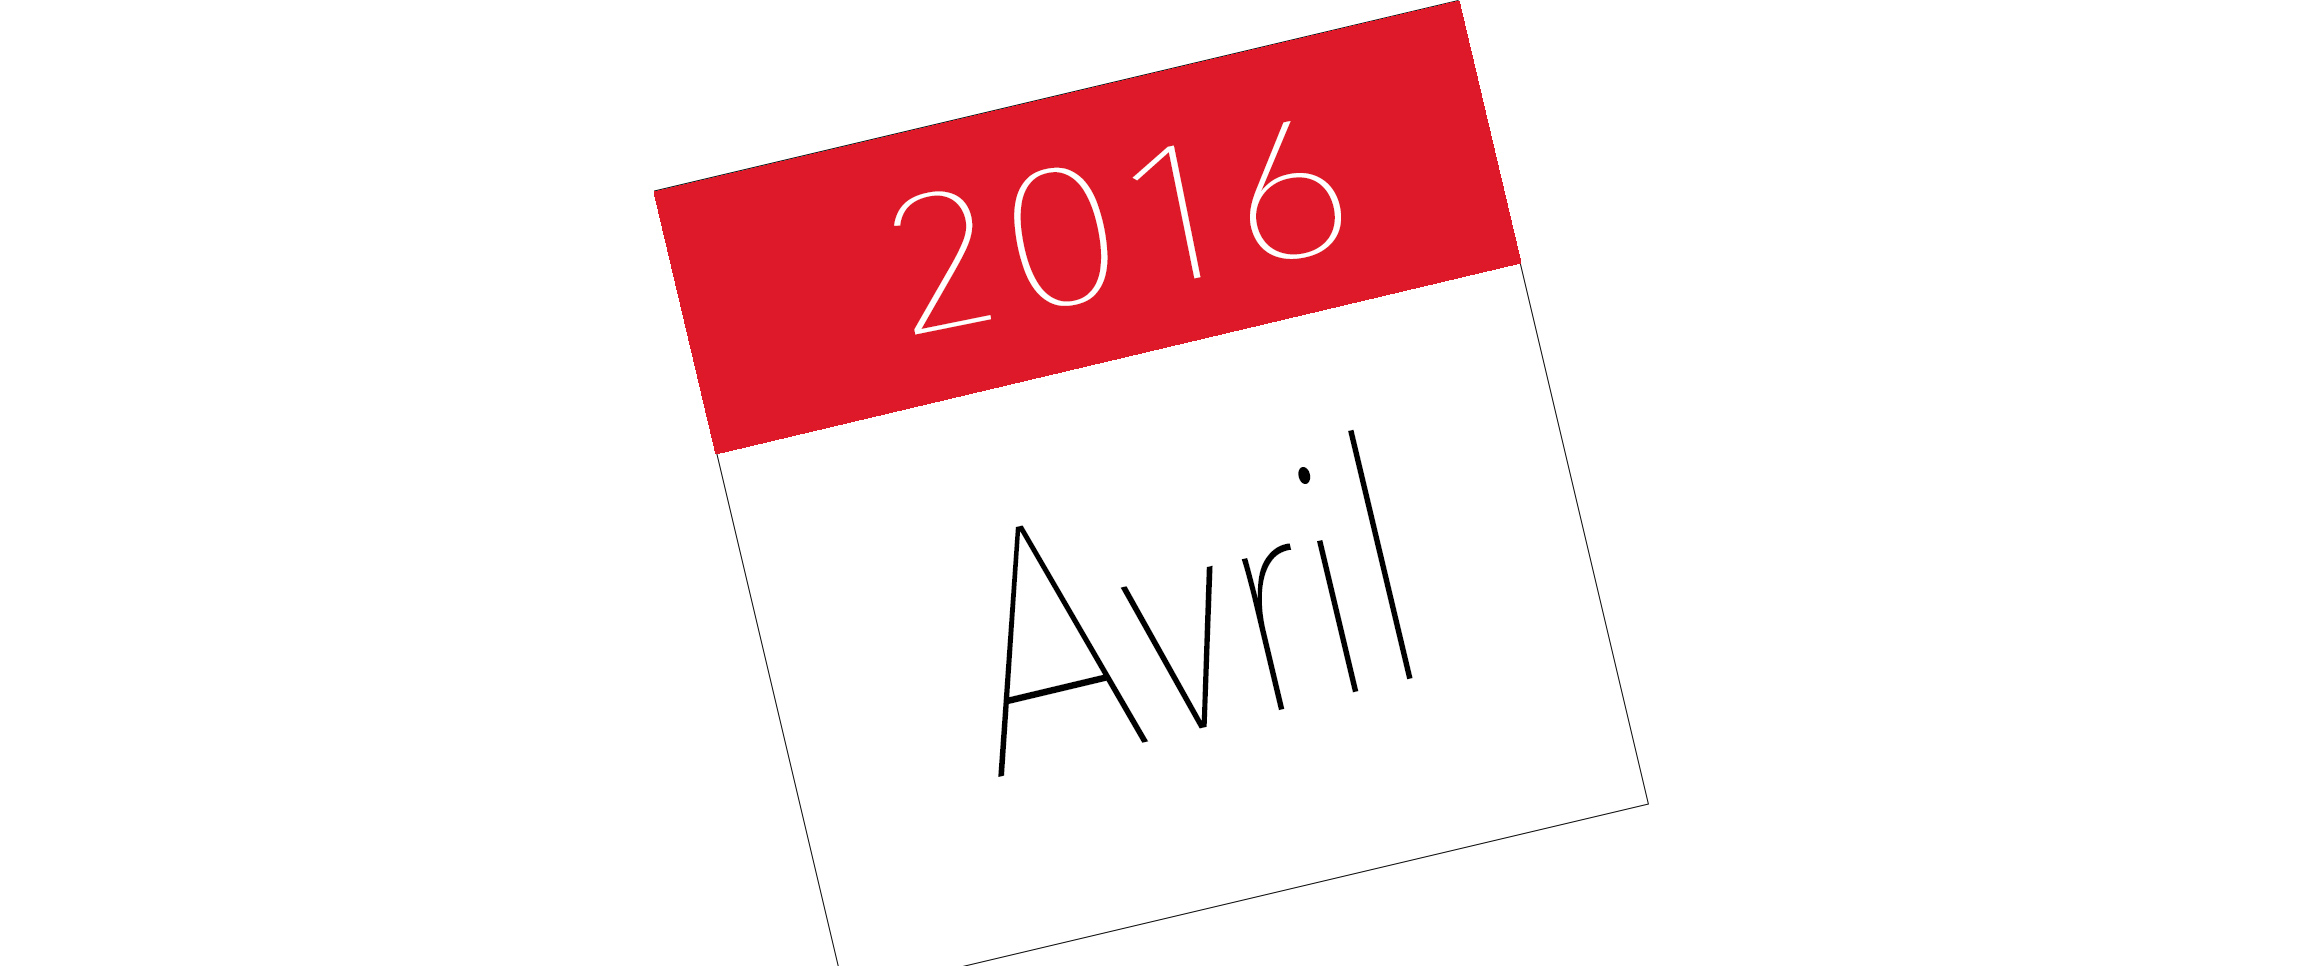 calendrier-site-avril-2016.jpg